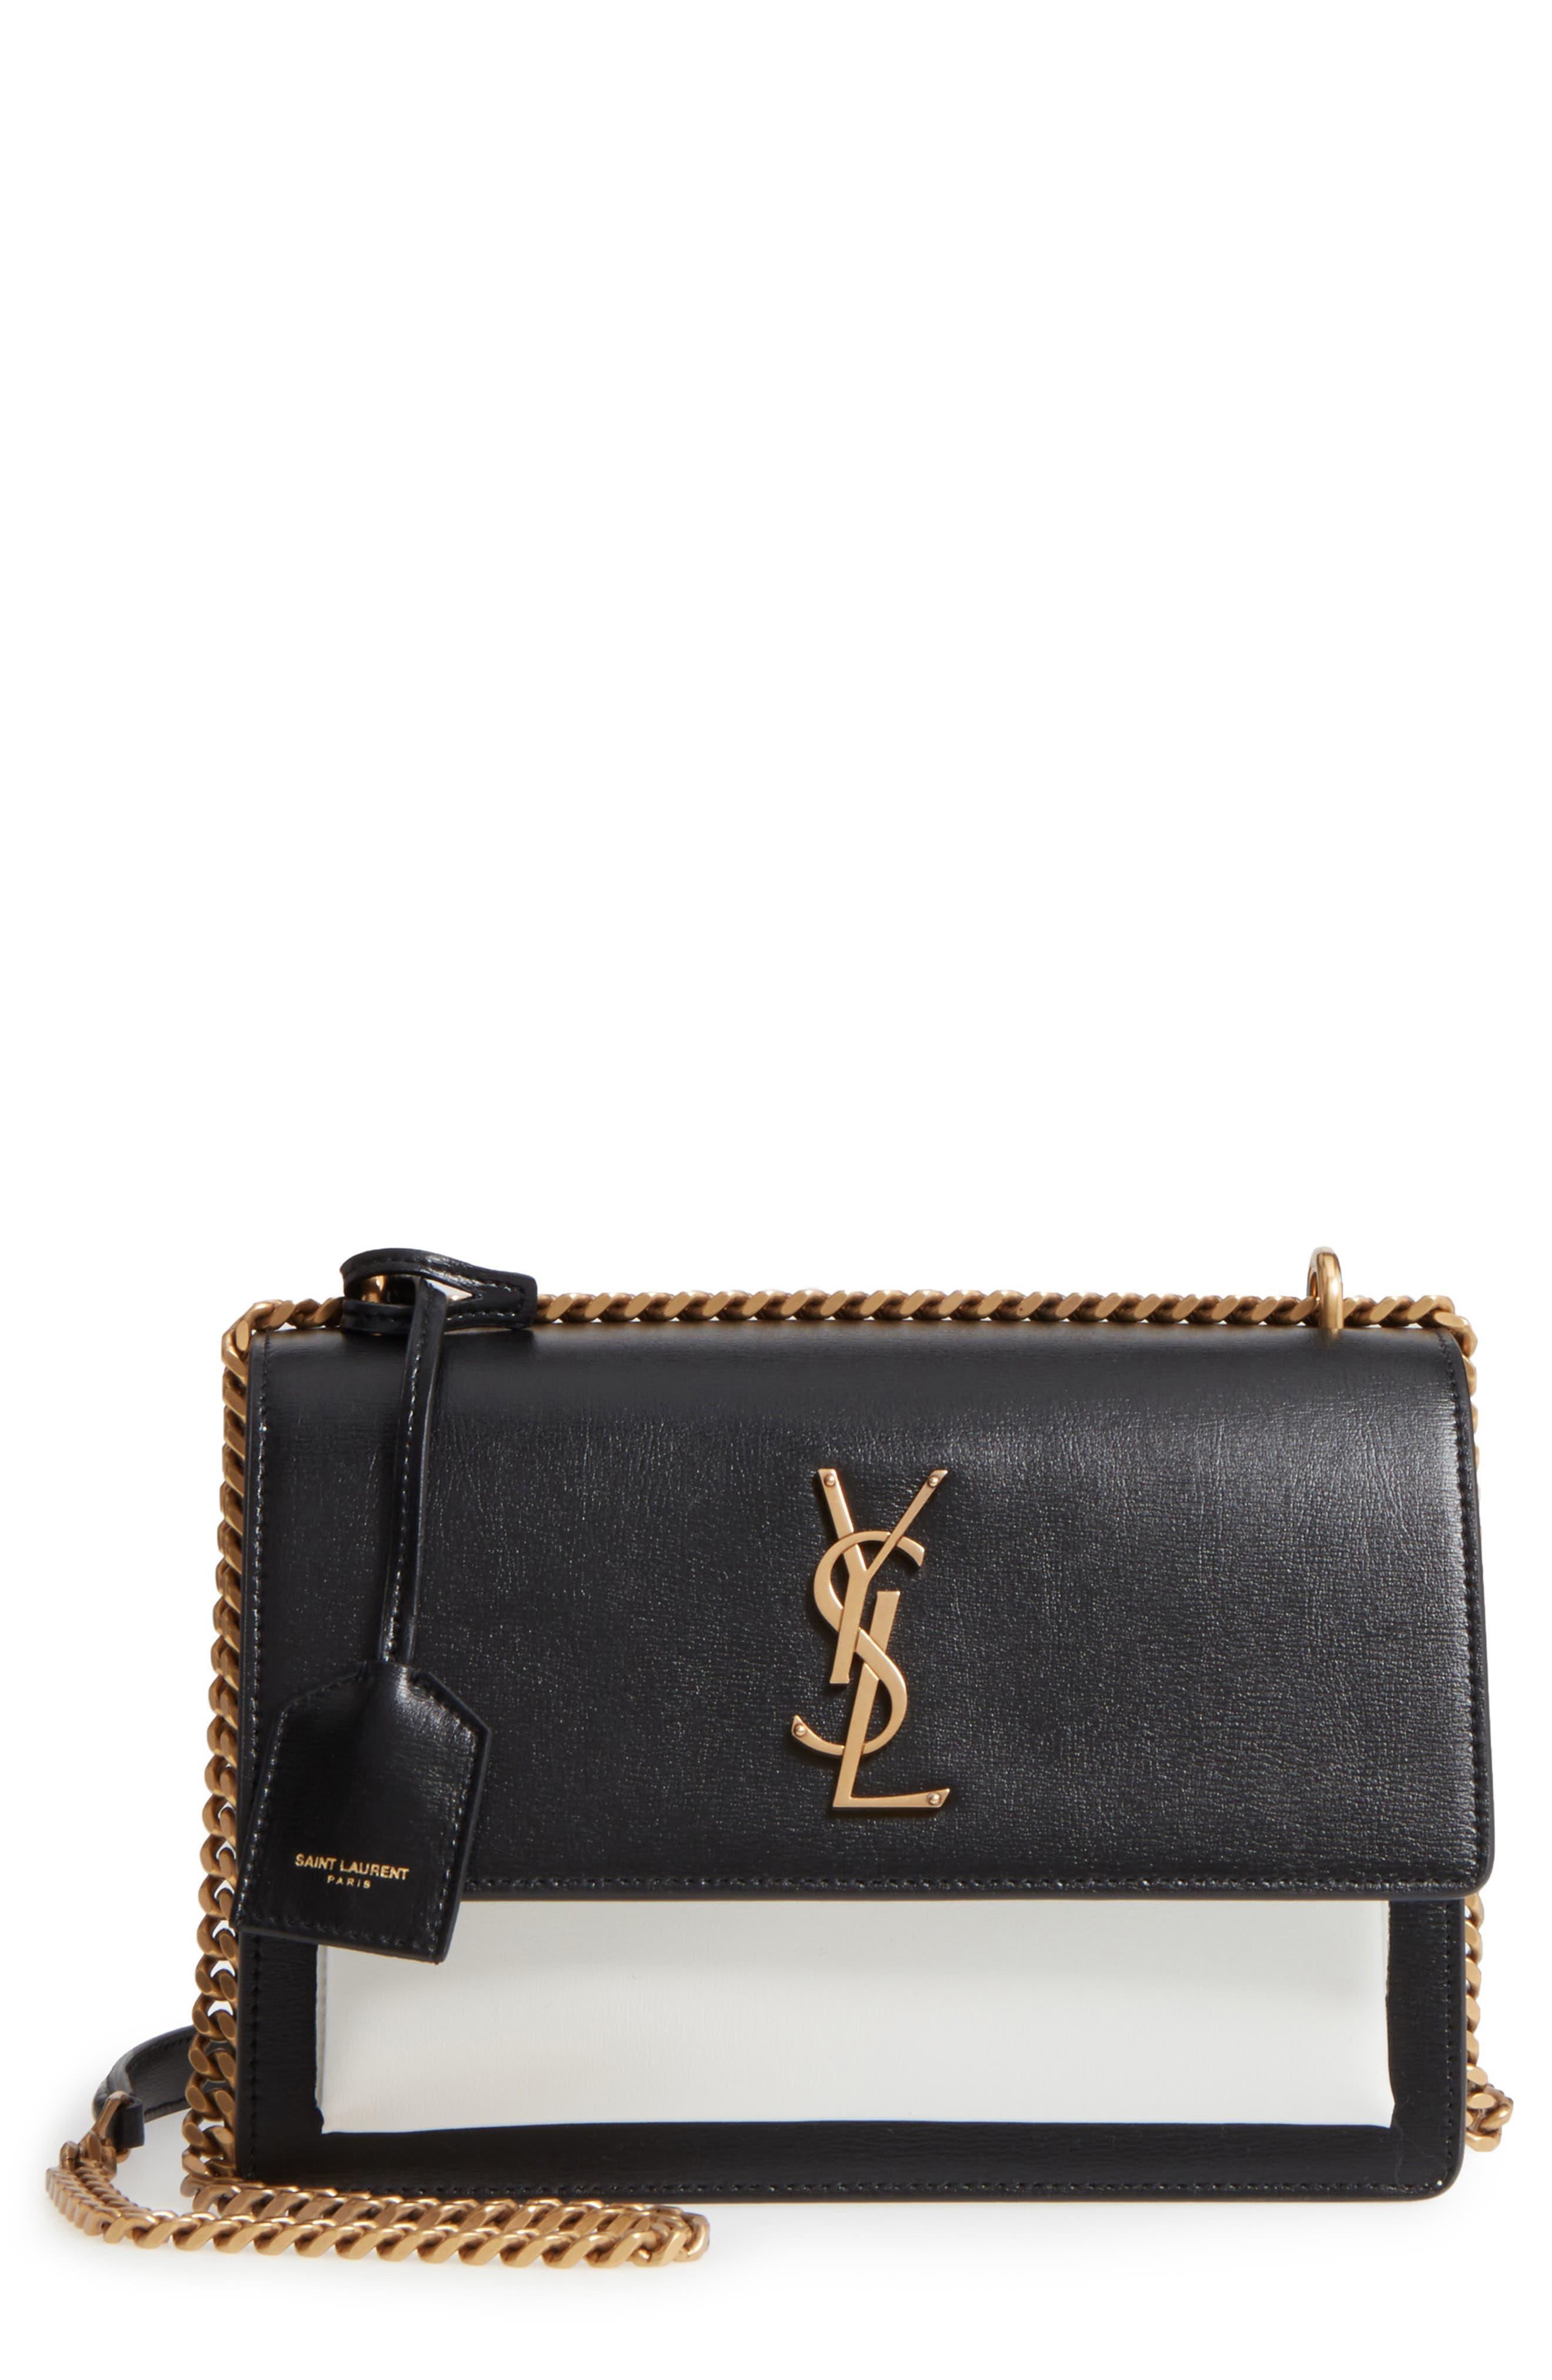 Medium Sunset Leather Shoulder Bag,                             Main thumbnail 1, color,                             001